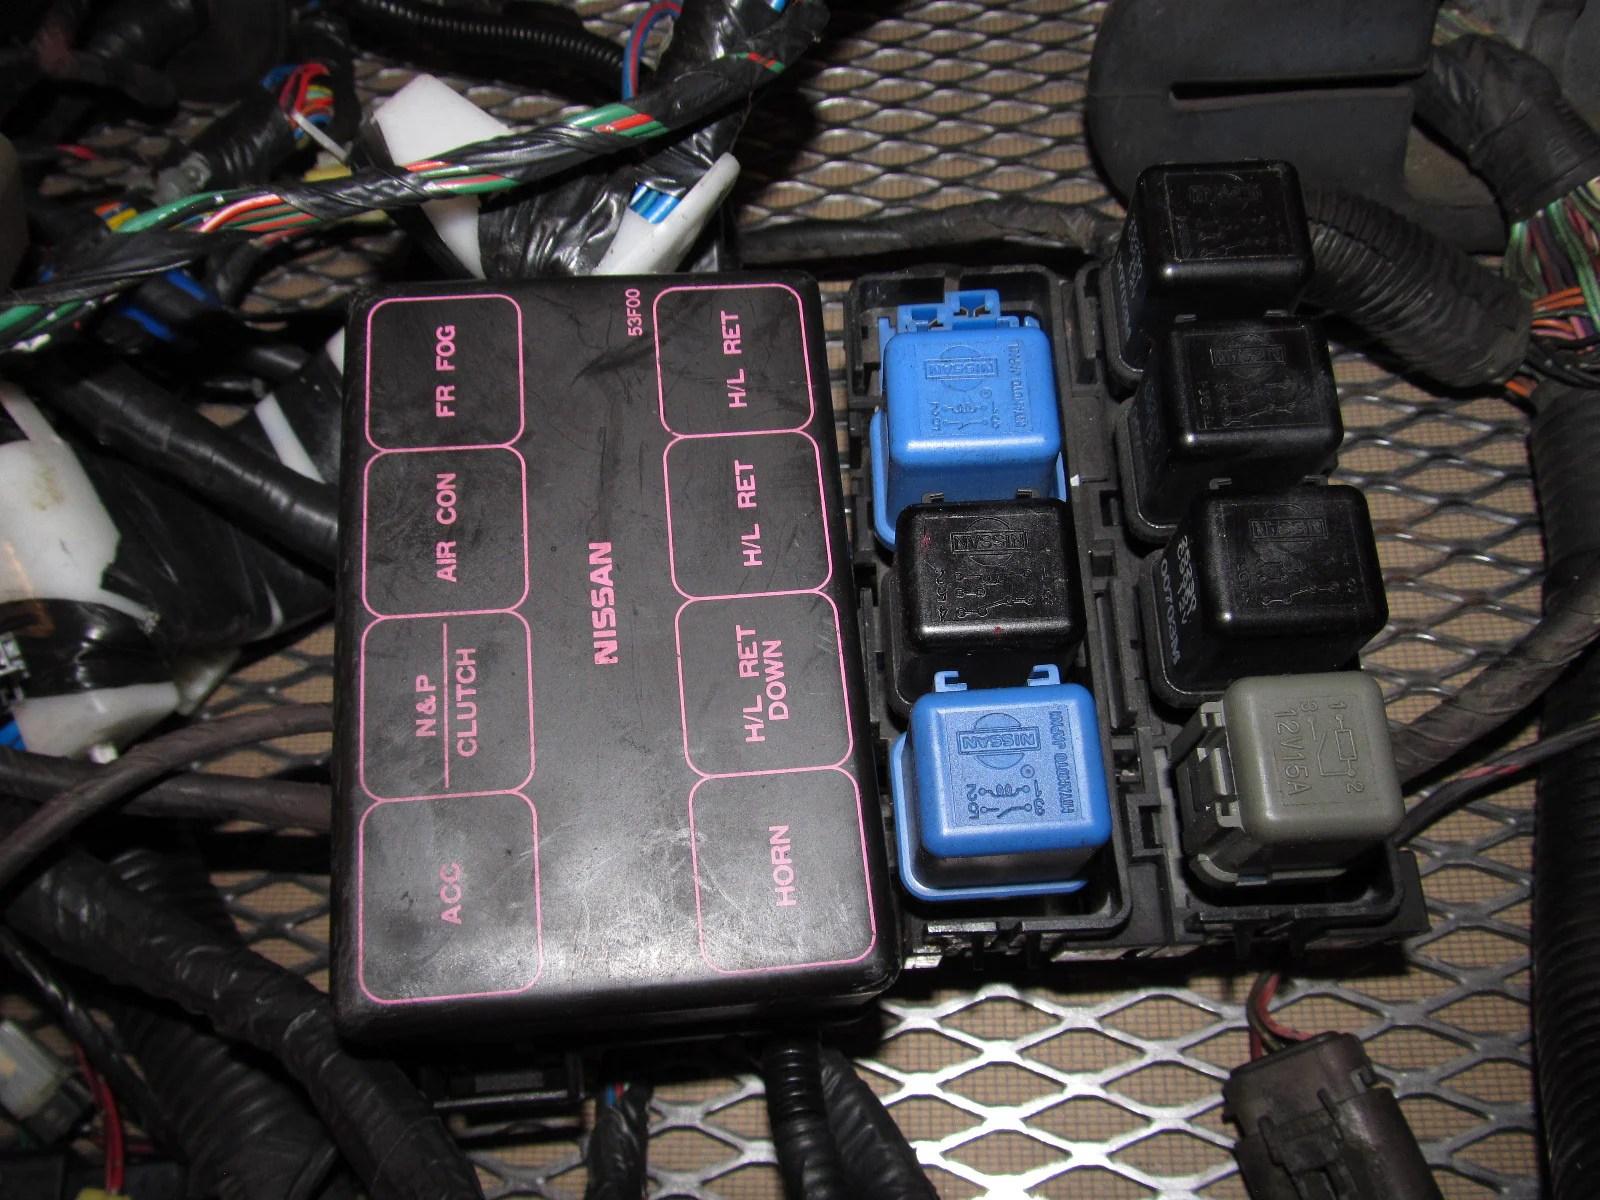 hight resolution of nissan 240sx fuse box wiring diagram third level mazda 3 fuse box nissan 240sx fuse box